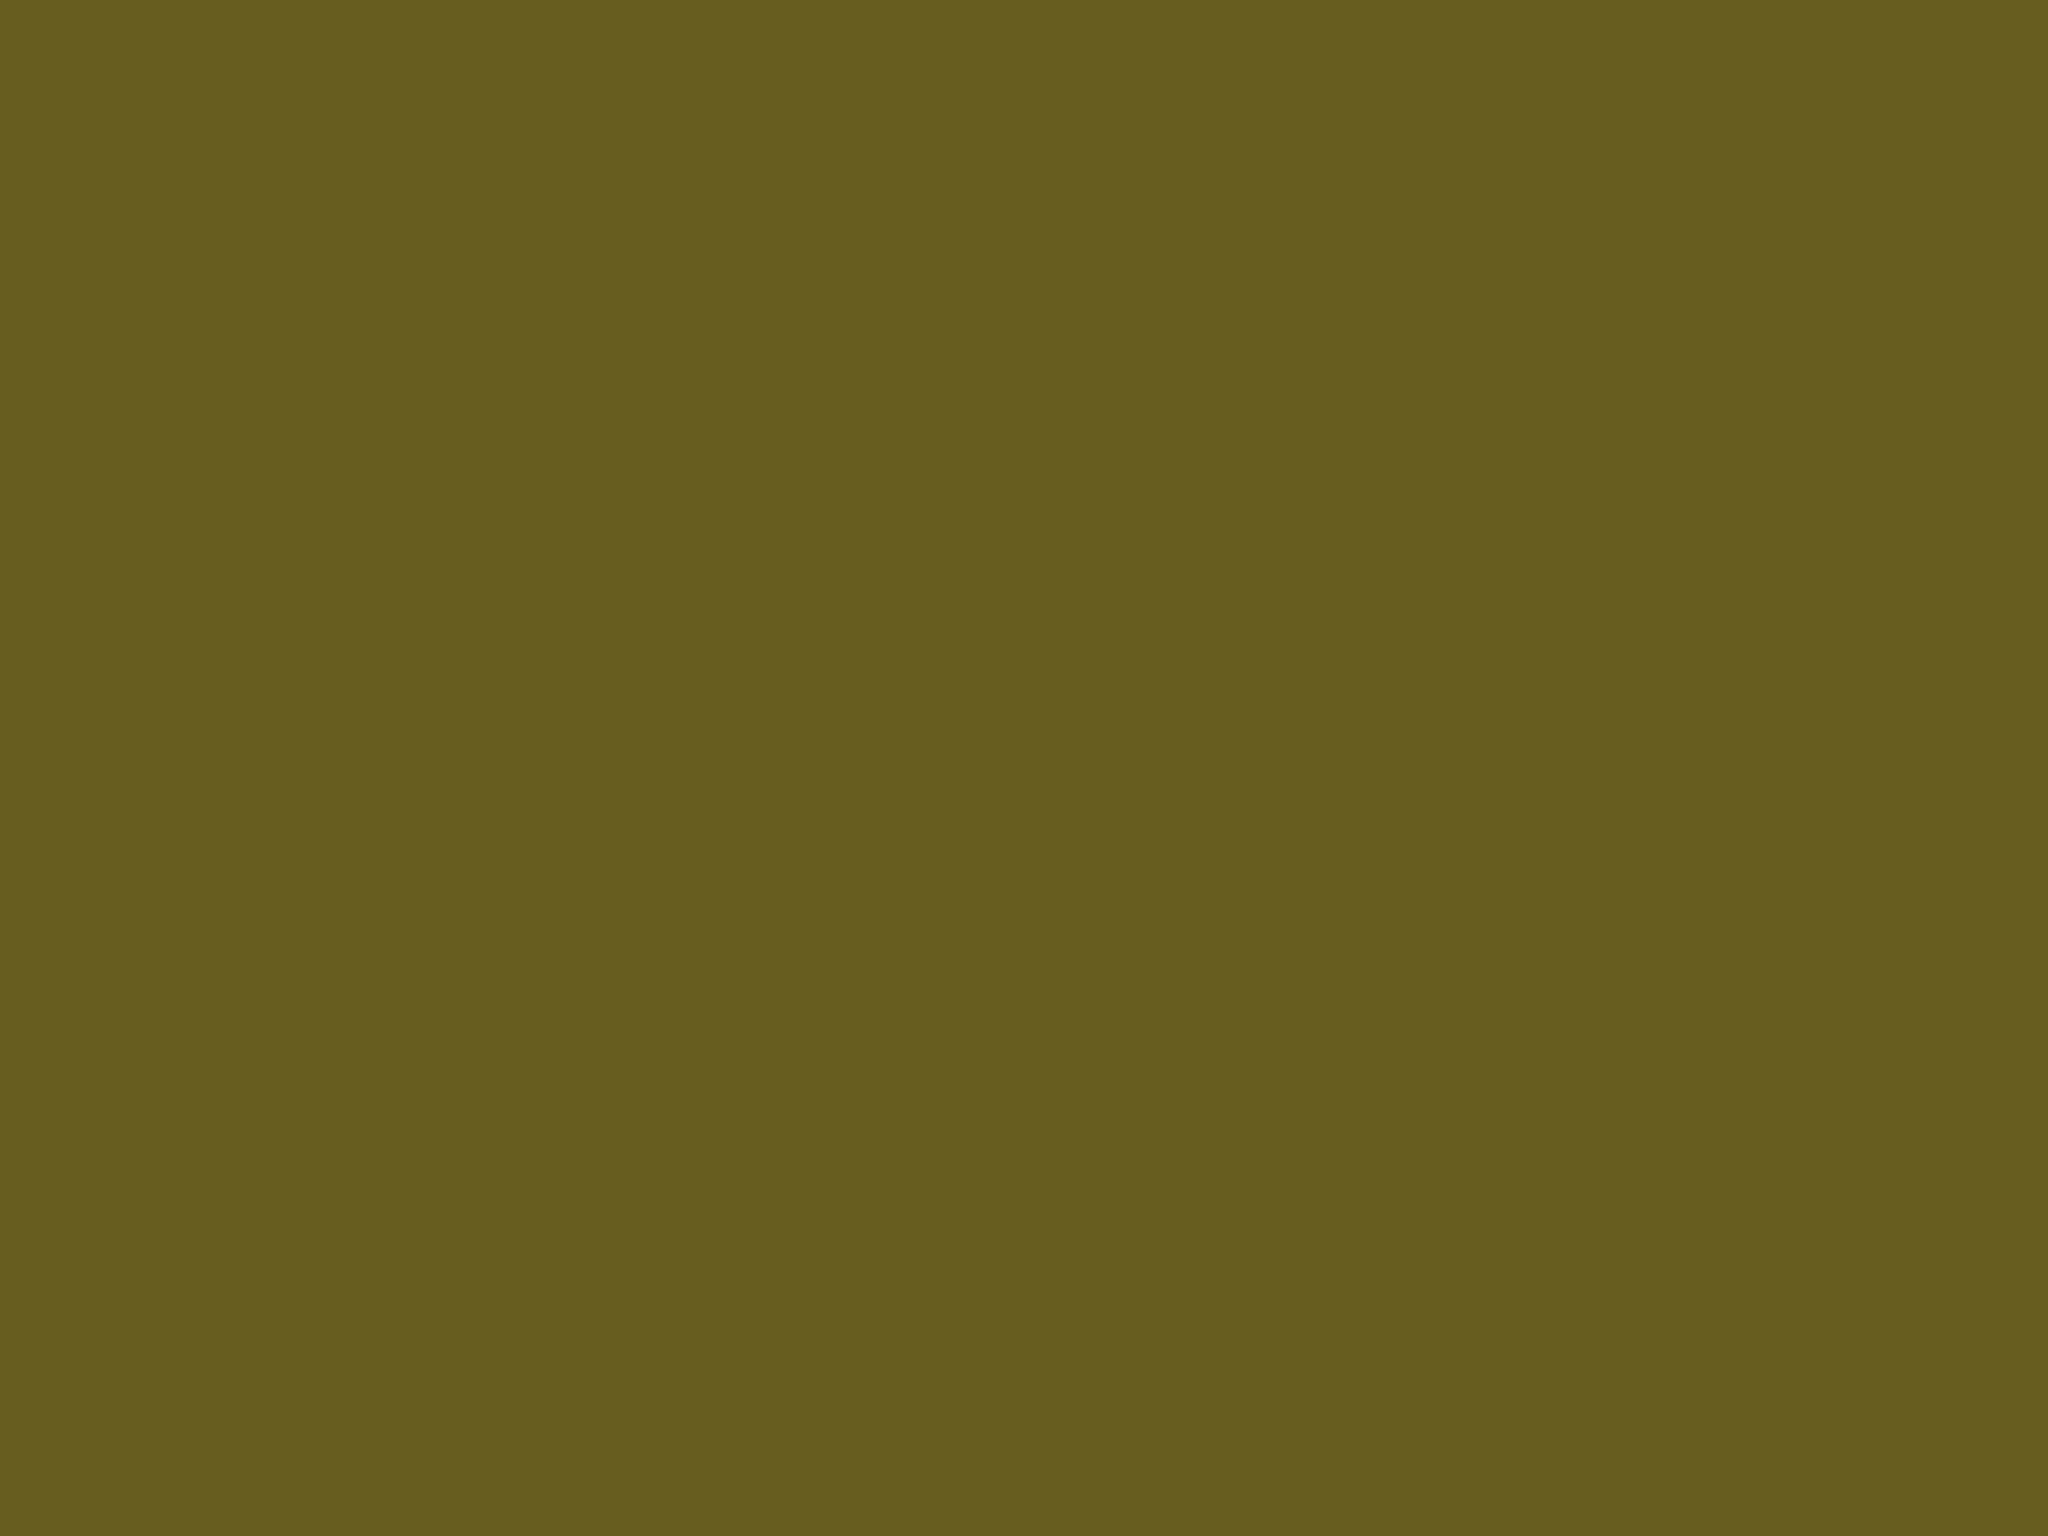 2048x1536 Antique Bronze Solid Color Background